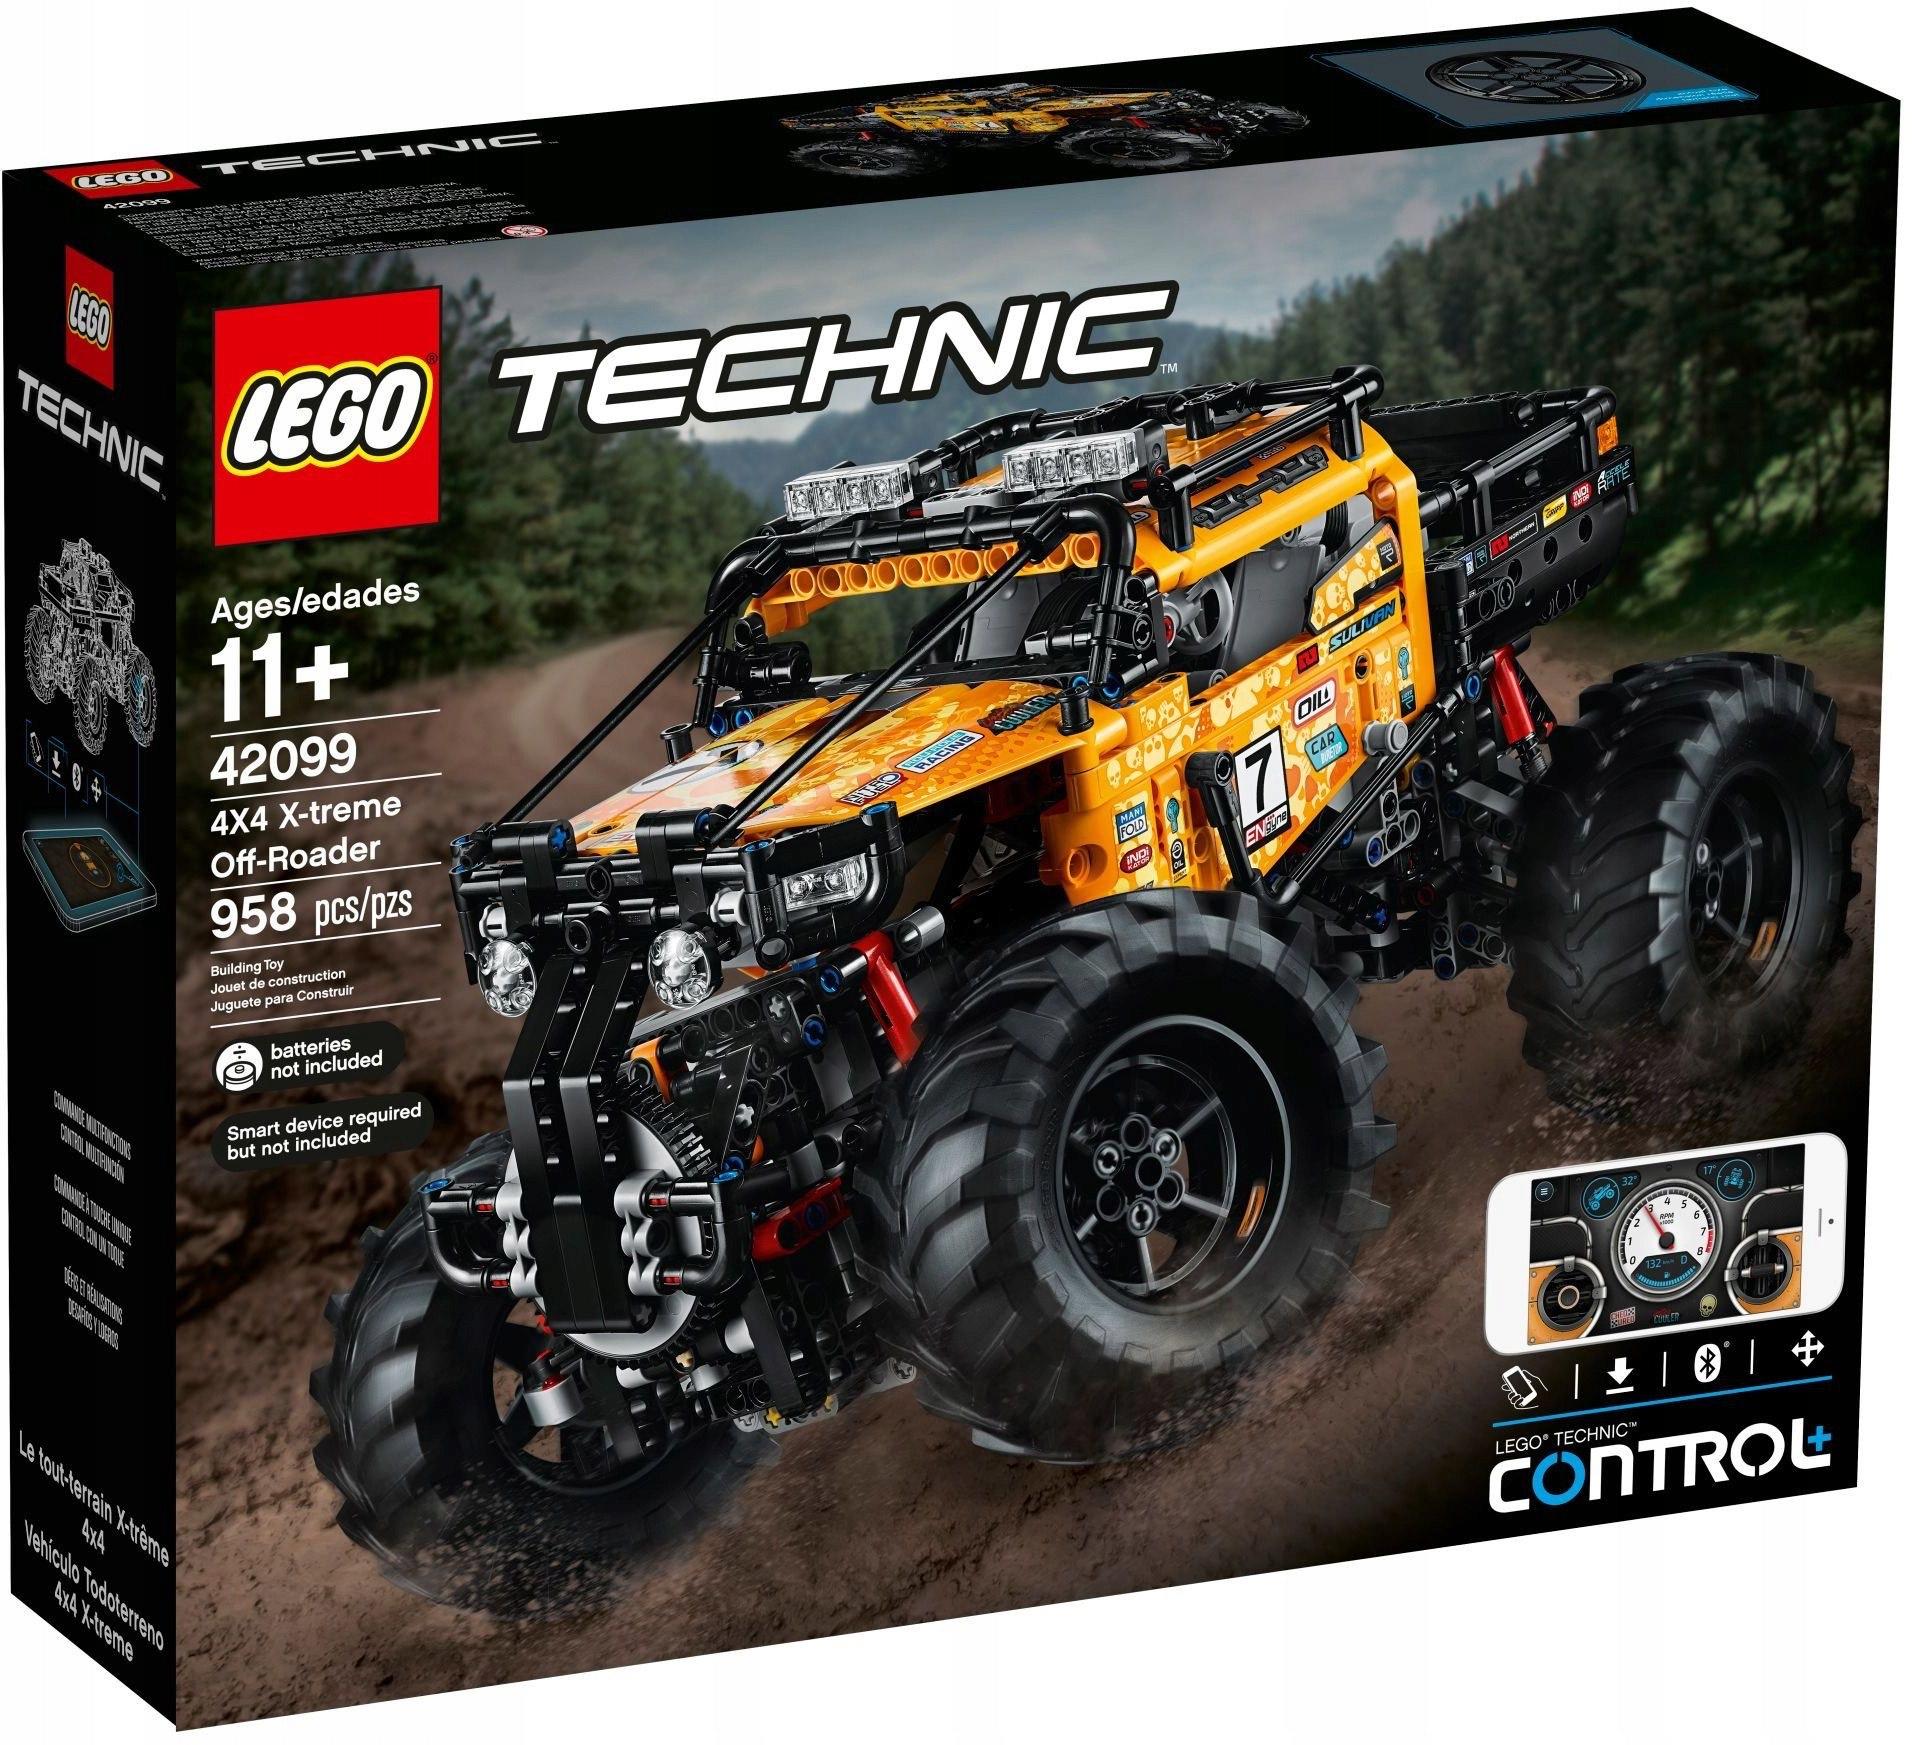 Lego technic 42099 Samochód terenowy Selgros